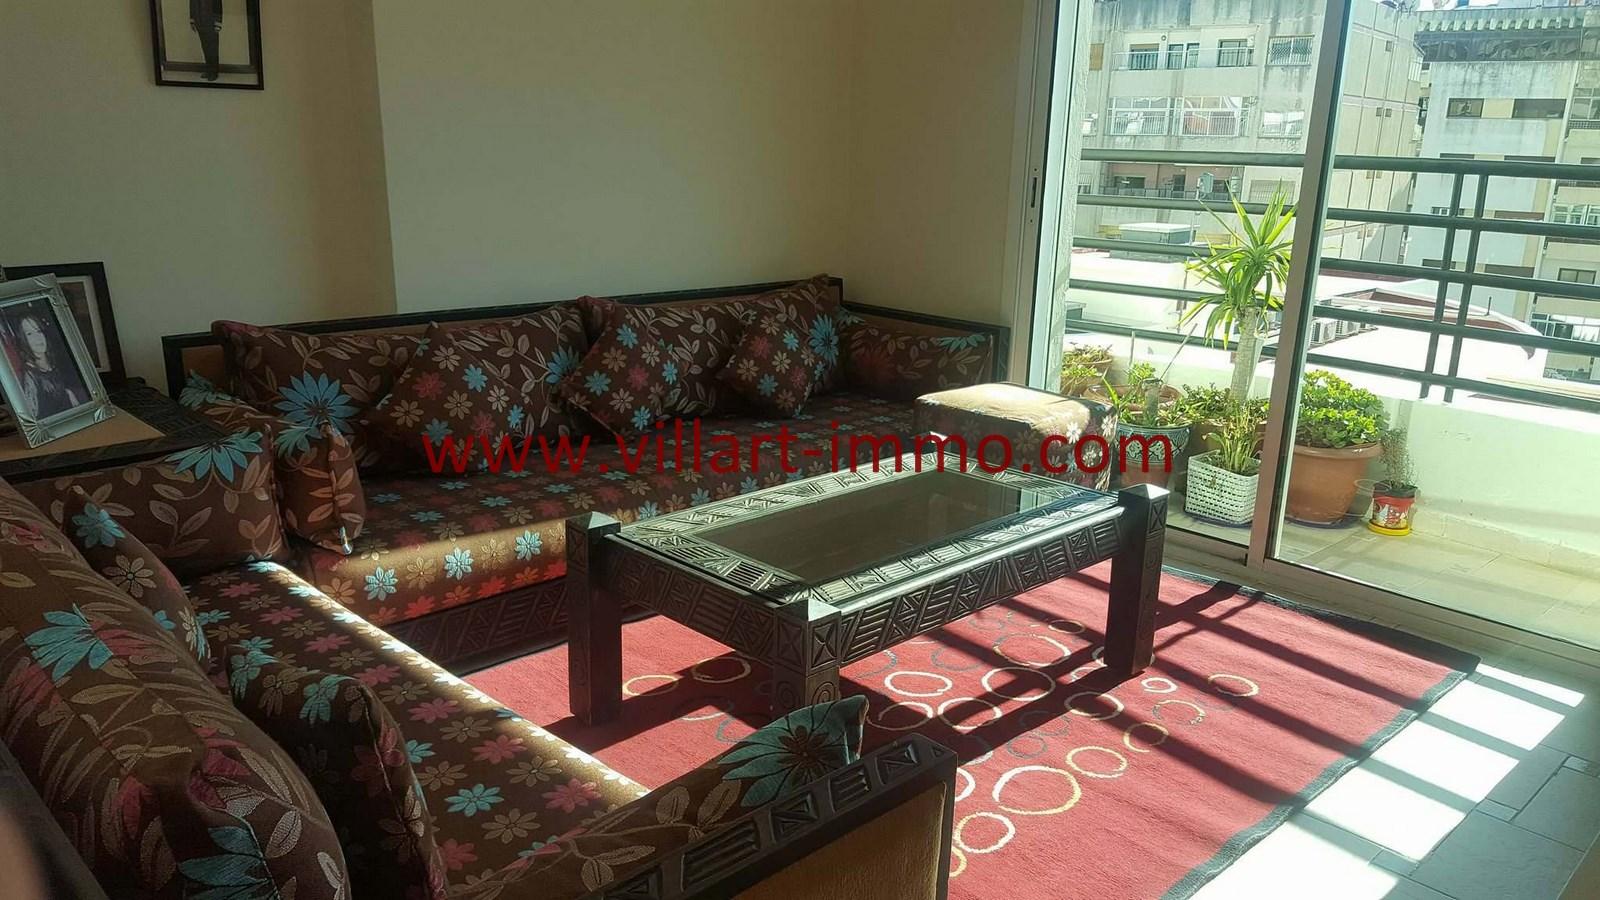 1-Vente-Appartement-Centre-ville-Tanger-Chambre 1-VA531-Villart Immo